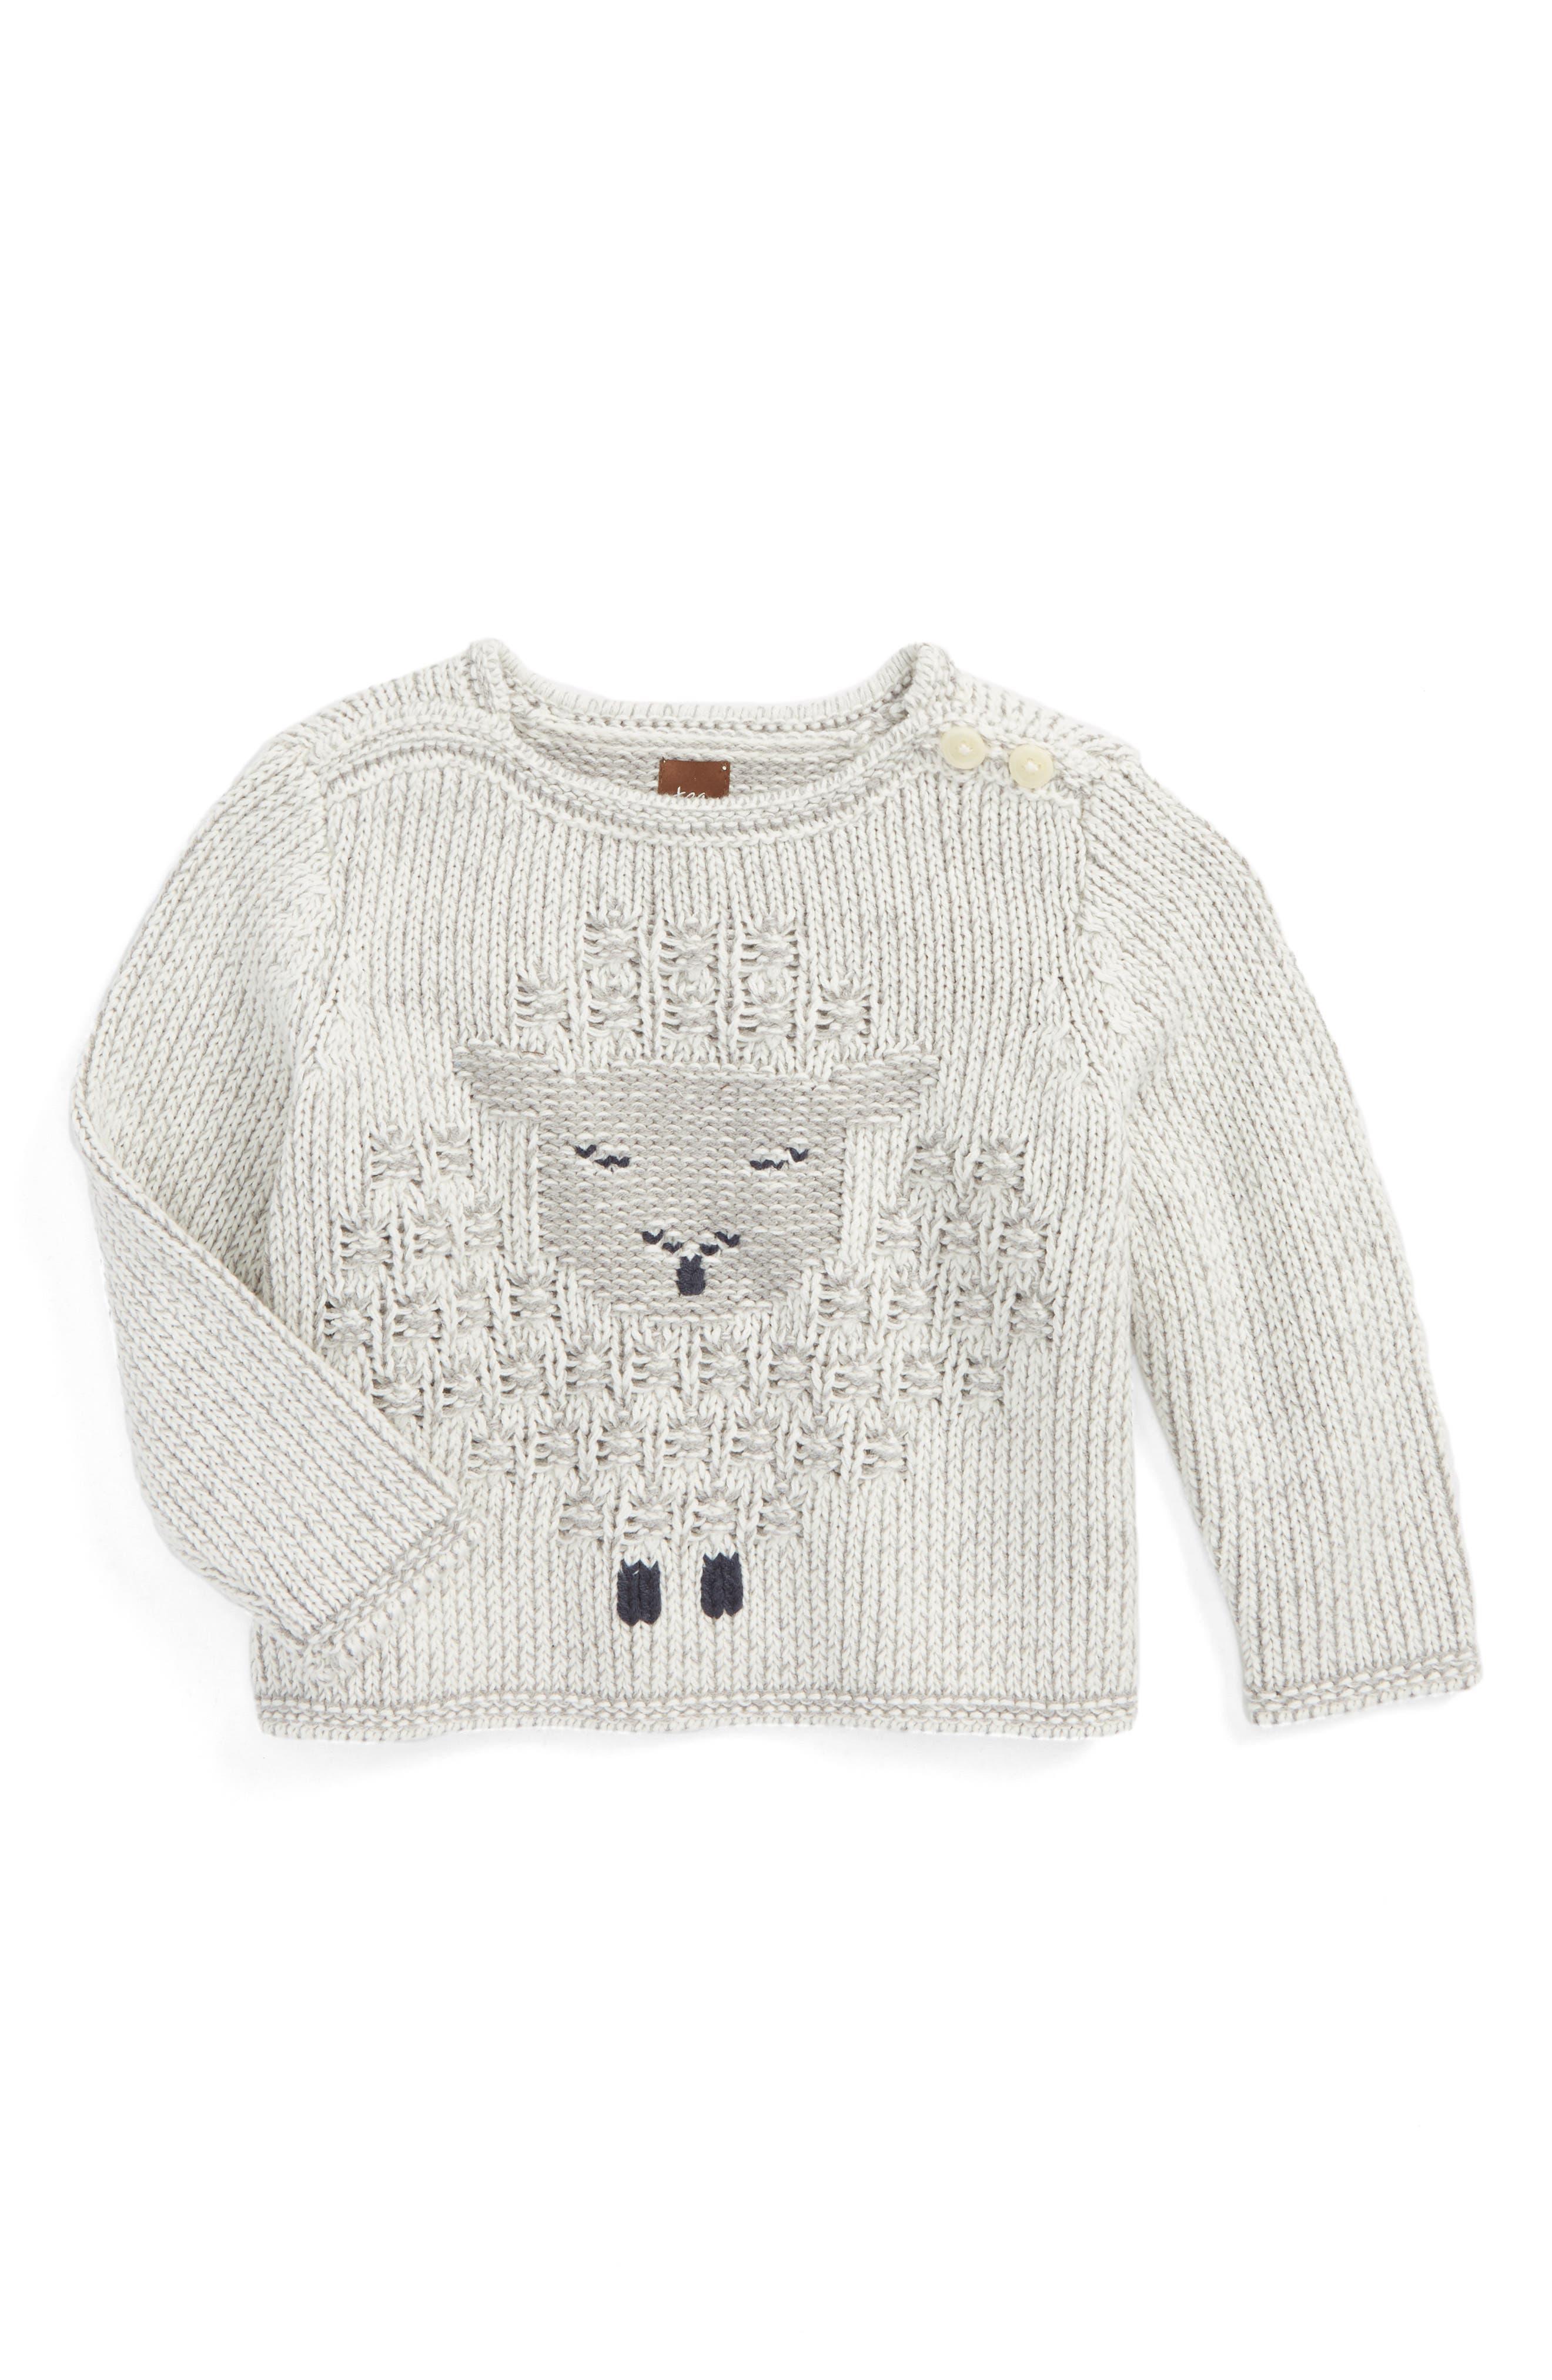 Alternate Image 1 Selected - Tea Collection Uan Sweater (Toddler Girls)